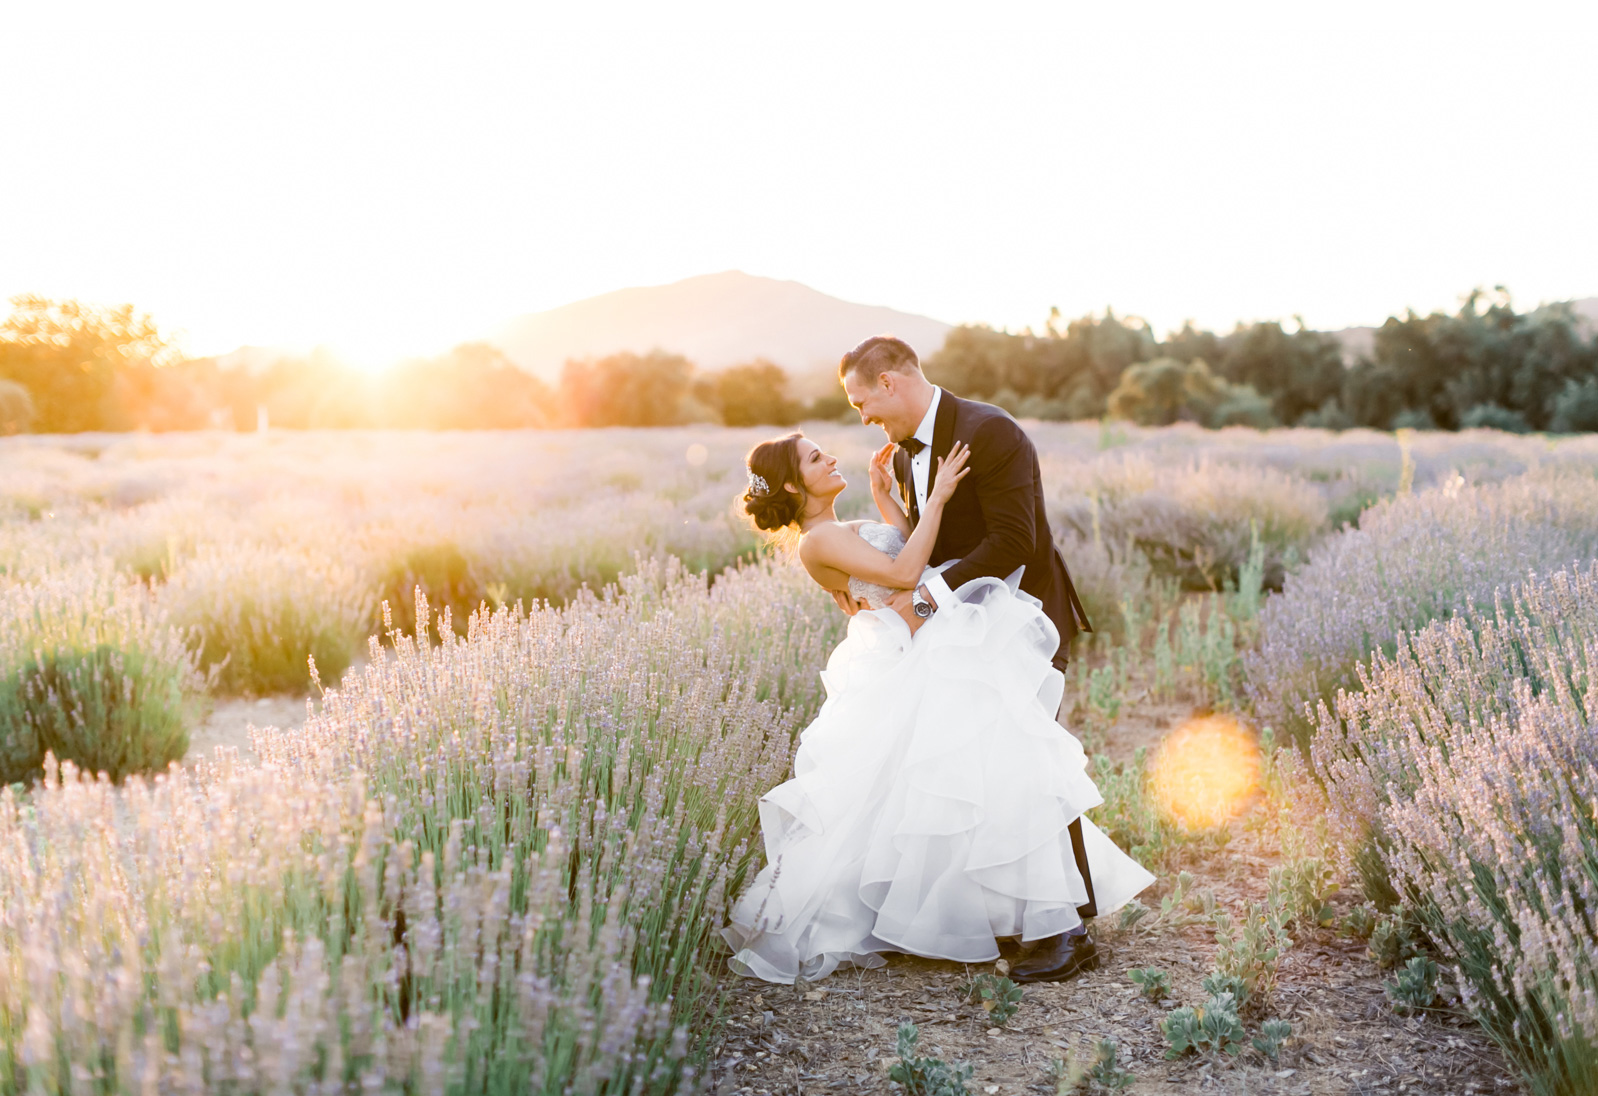 California-Lavender-Field-Wedding-Natalie-Schutt-Photography-Style-Me-Pretty_17.jpg